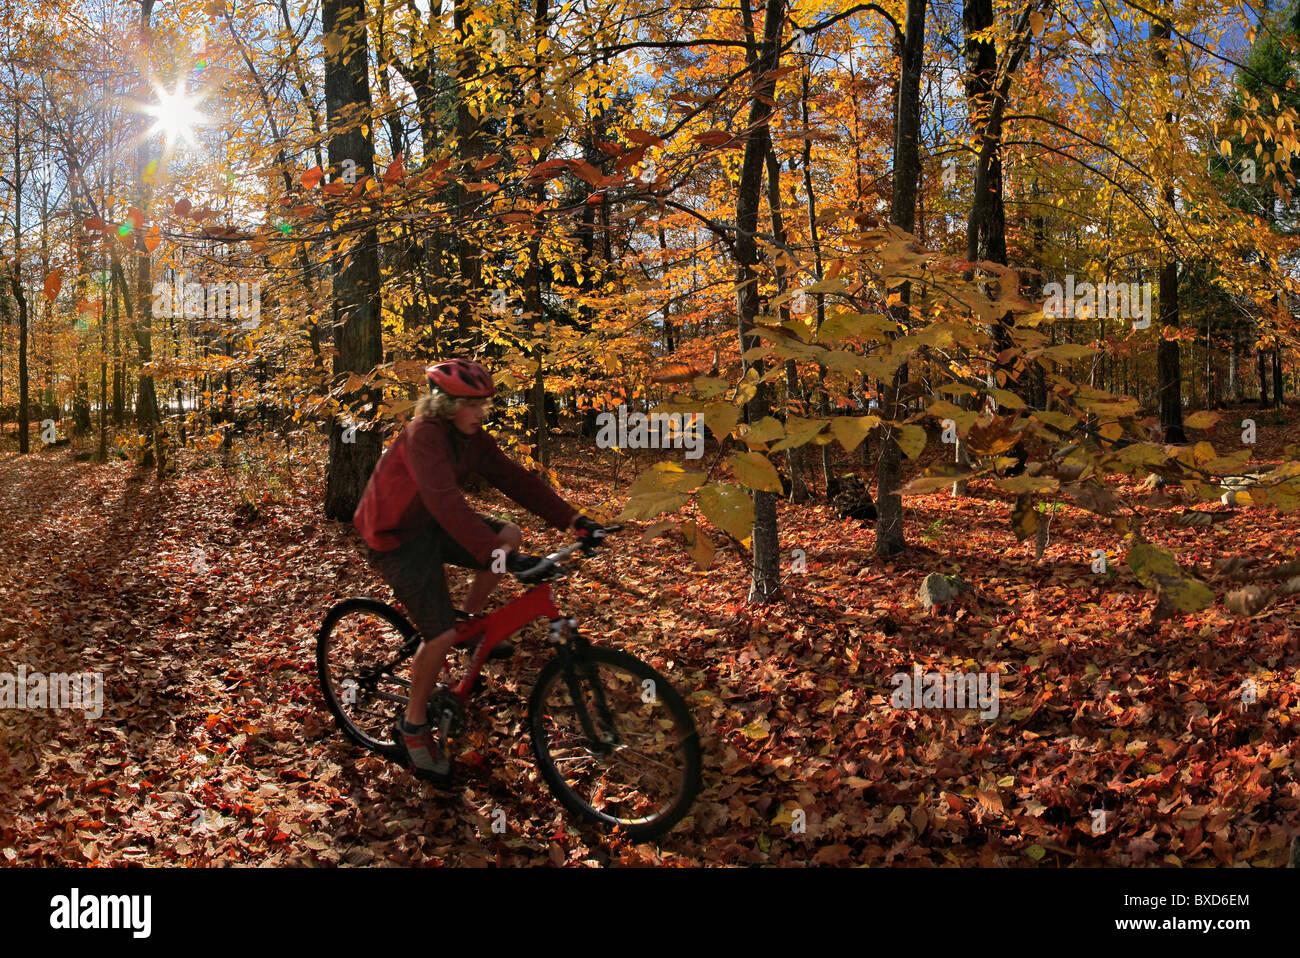 Mountainbiker fahren durch Herbst Blätter, Adirondack Park, New York State, USA Stockbild